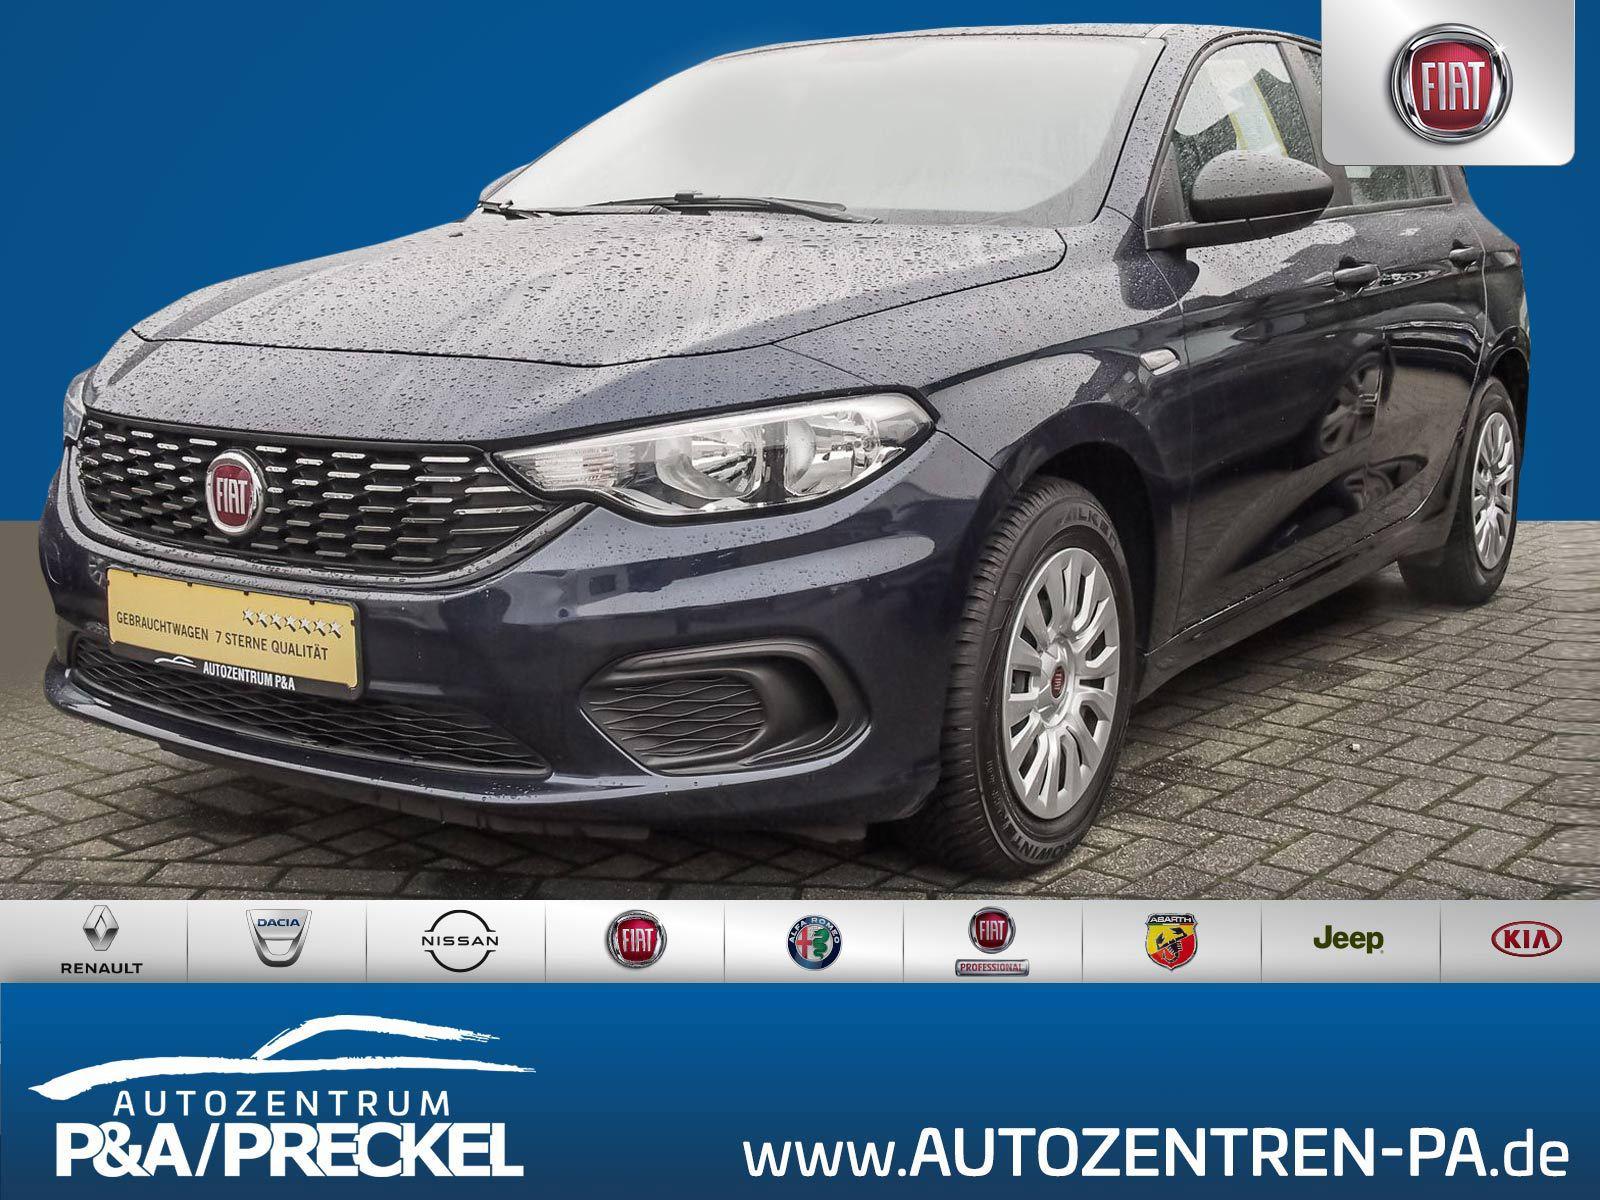 Fiat Tipo Pop 1.4 16V / Klima / PDC / Tempomat, Jahr 2017, Benzin